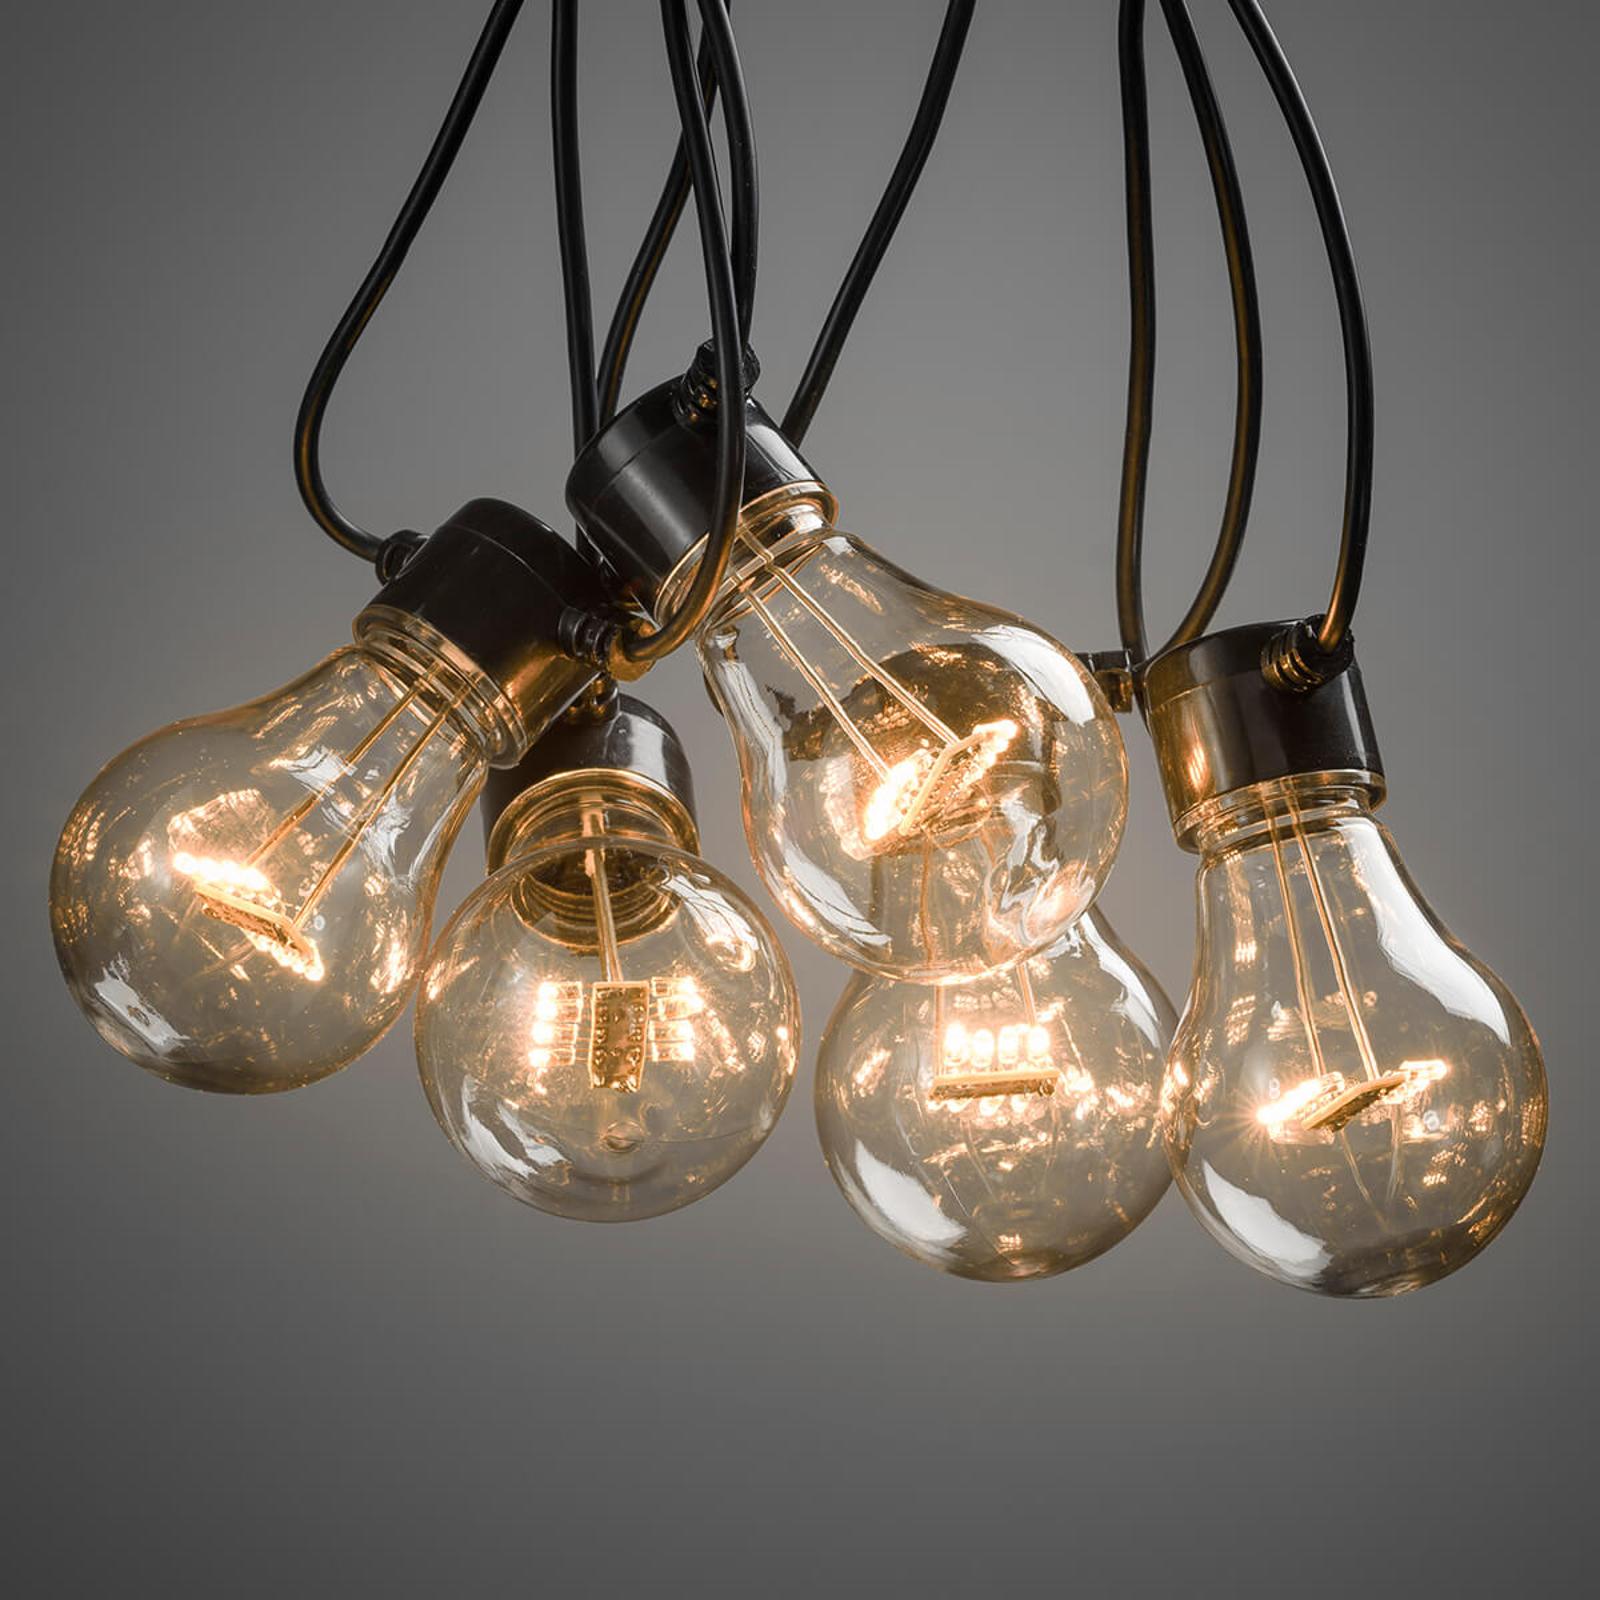 LED-ljusslinga Biergarten, 10 ljuskällor